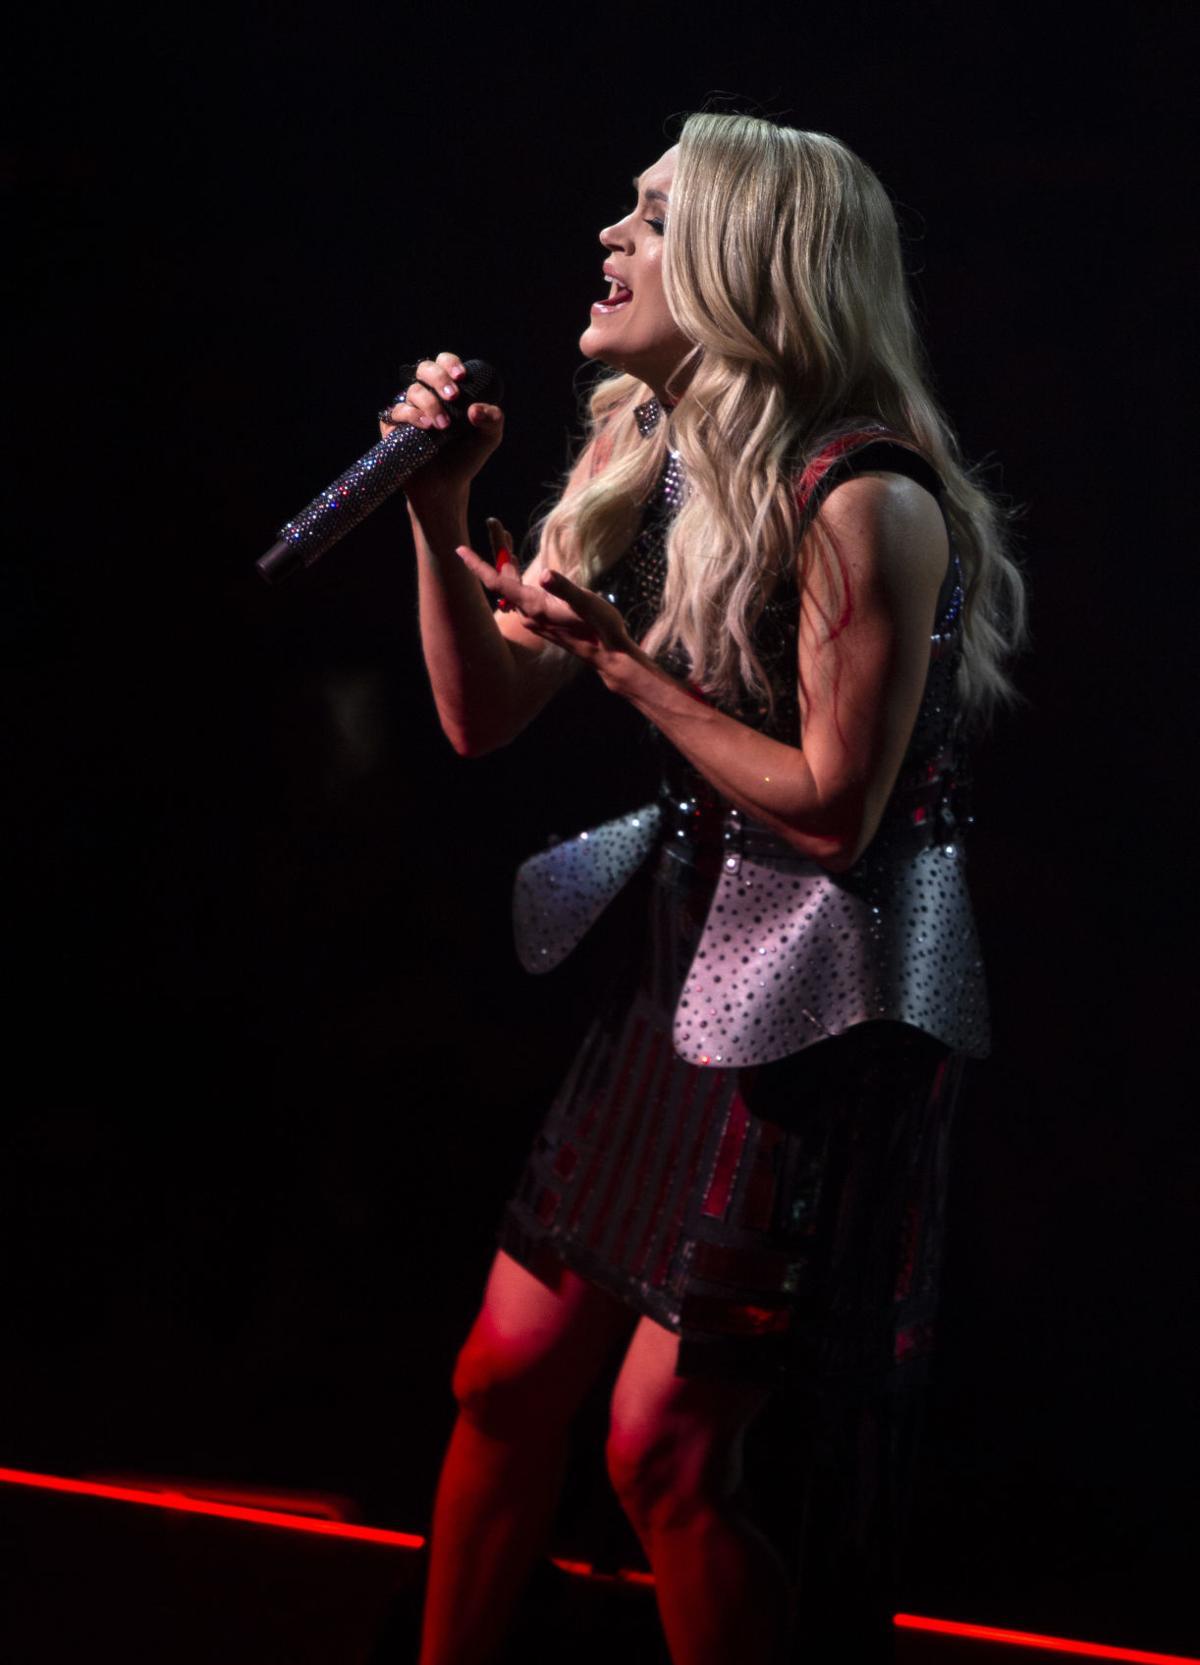 Carrie Underwood, 6.23